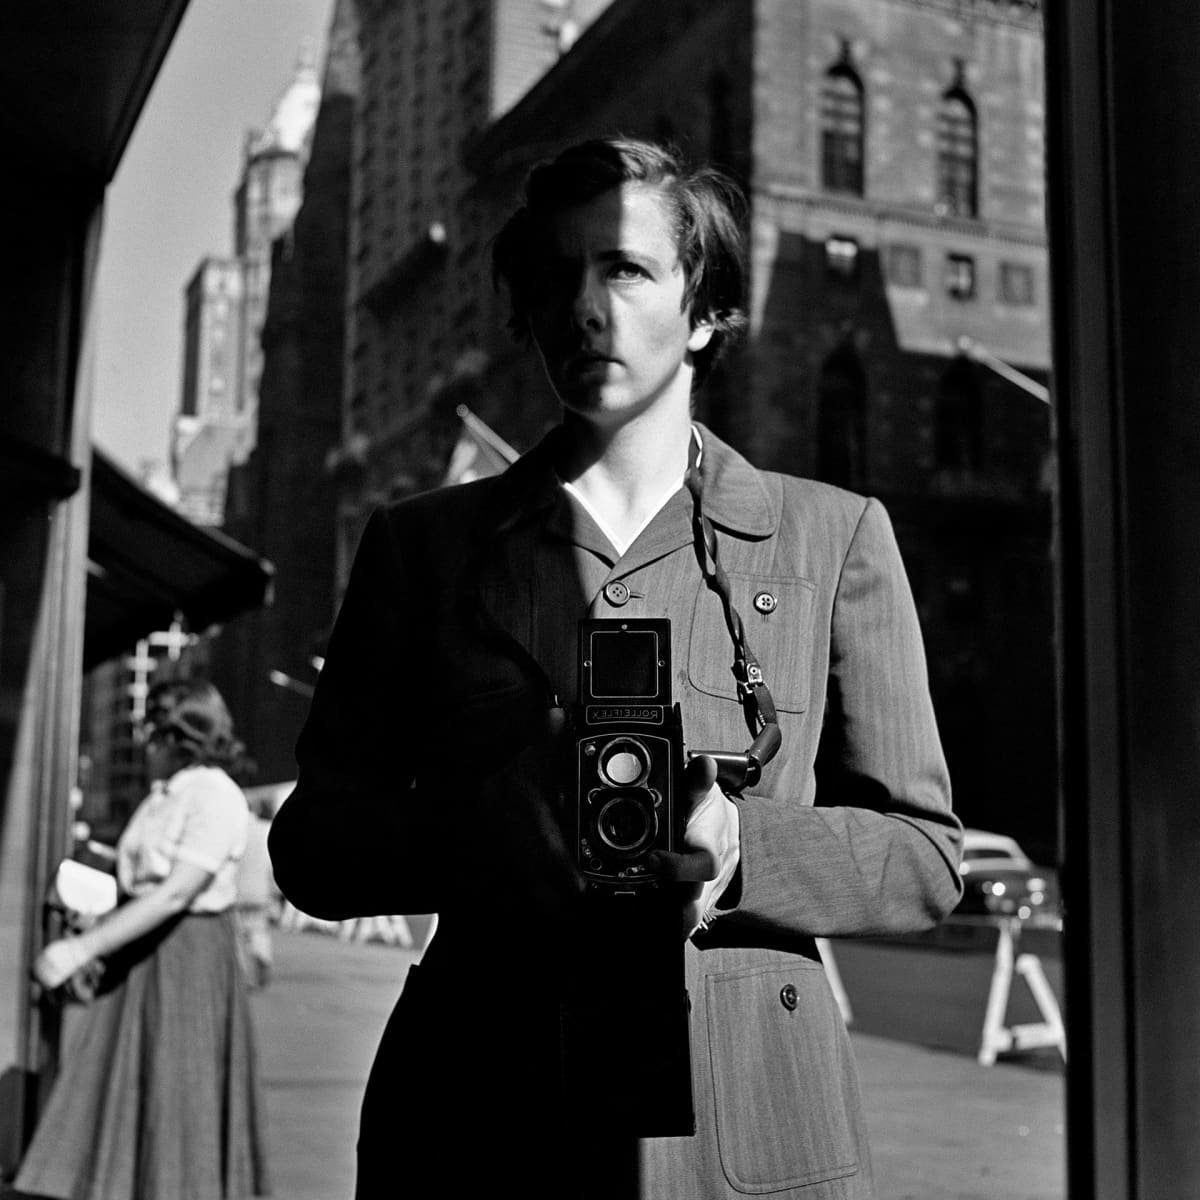 Vivian Maierin omakuva, heijastus